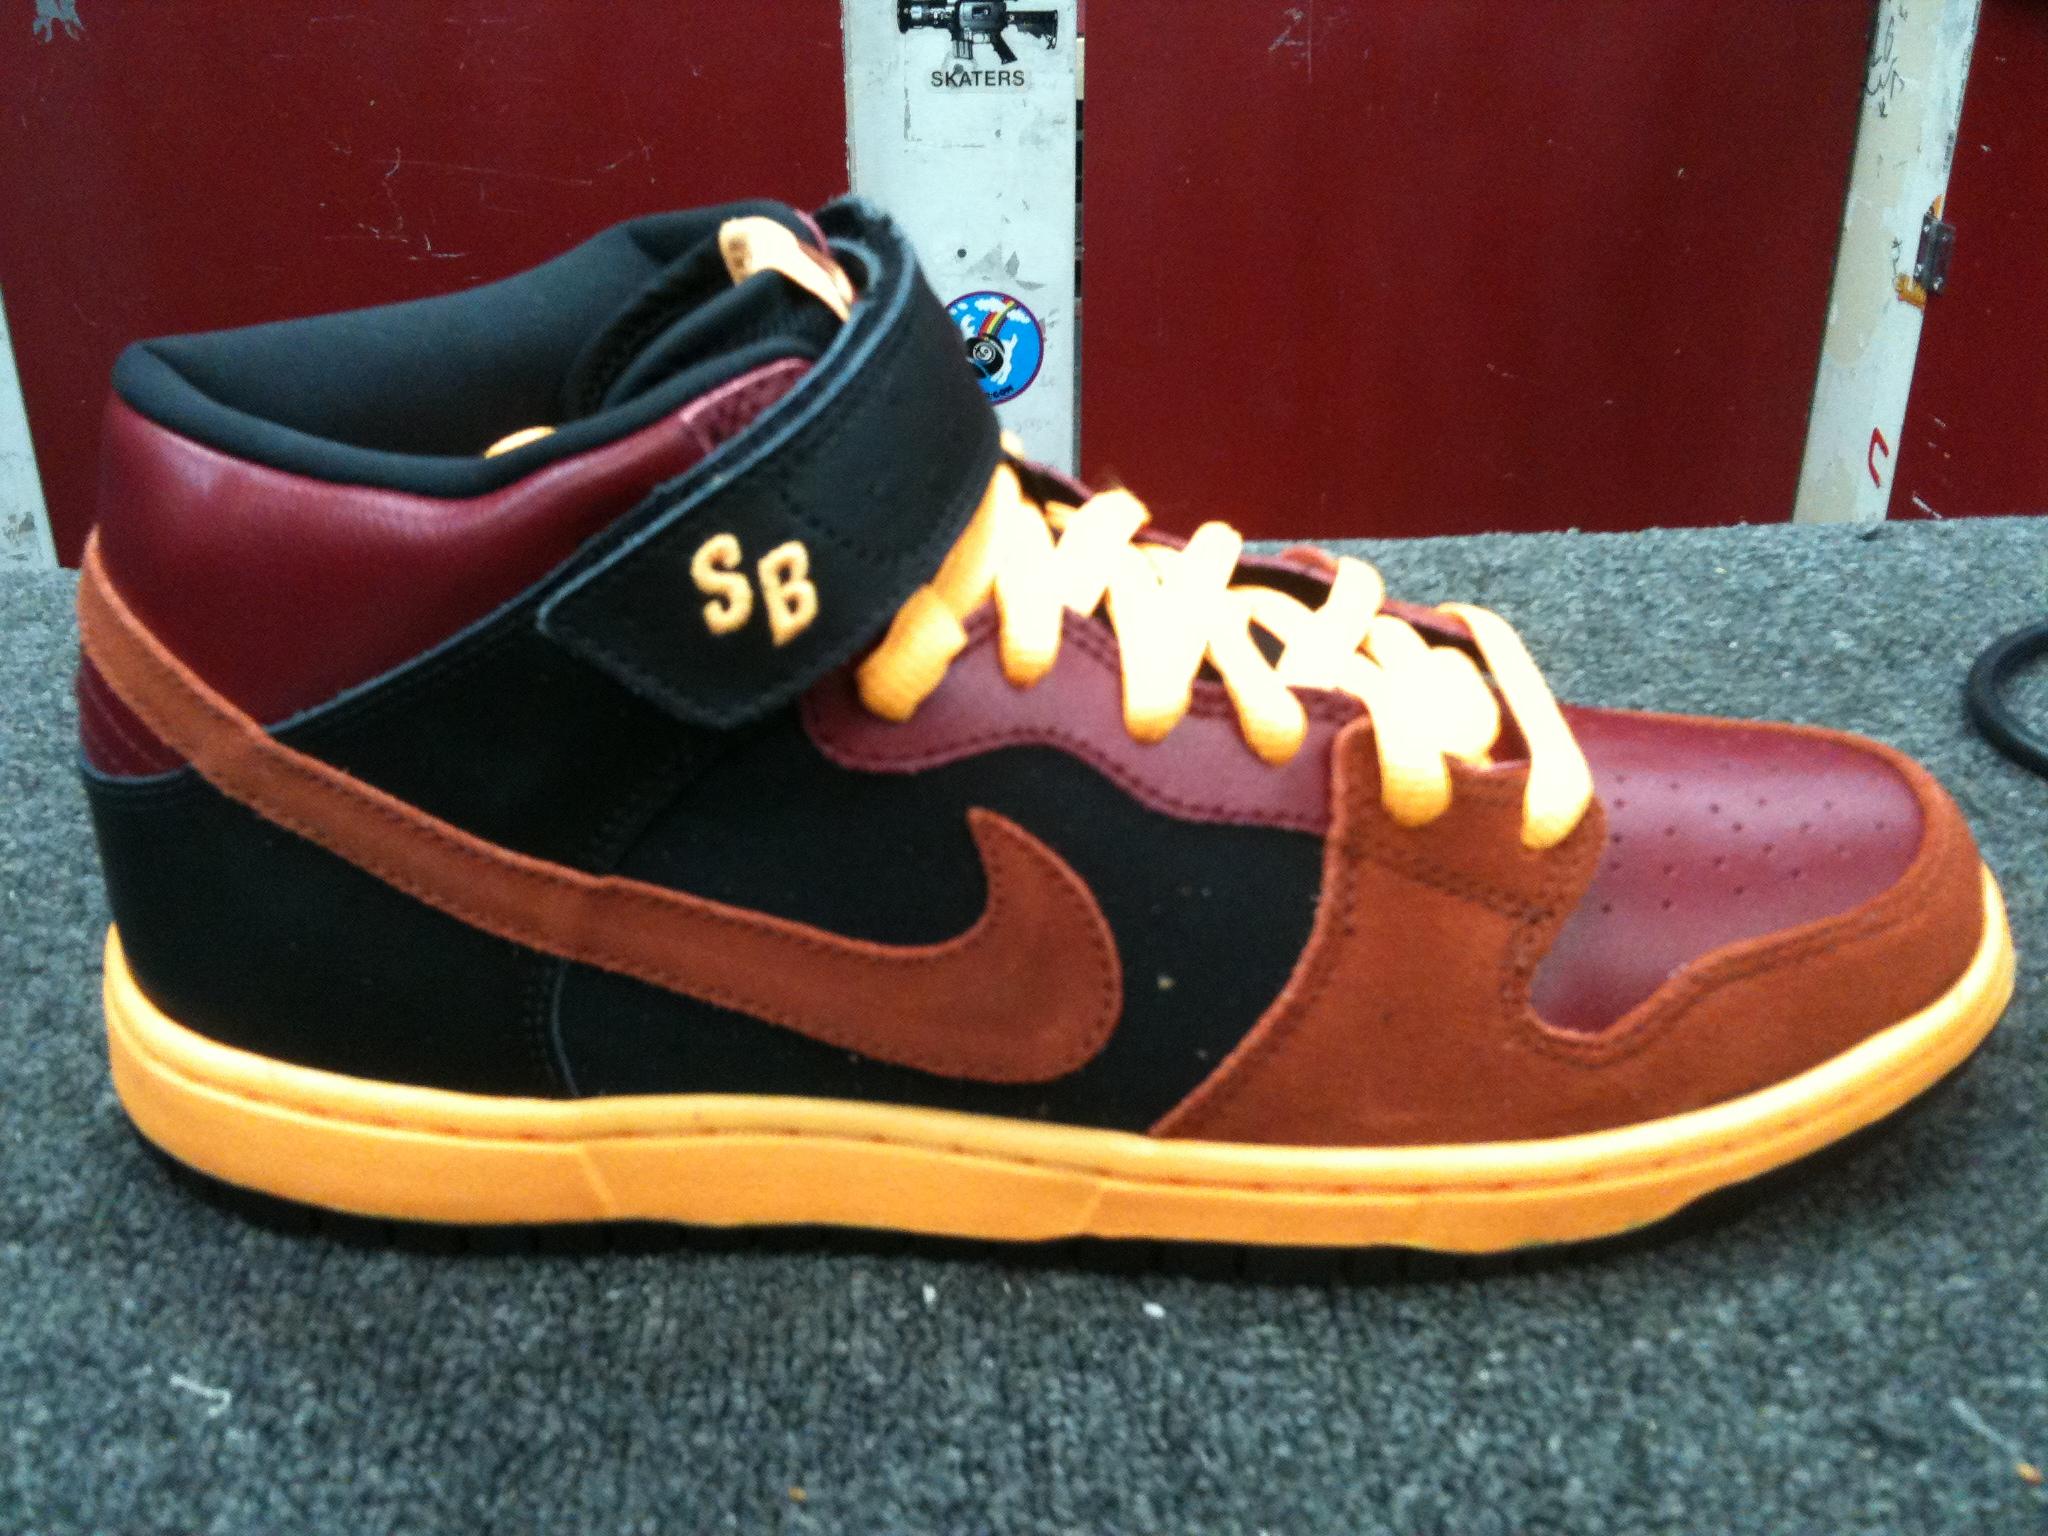 Nike SB Dunk Mid - Spring 2013